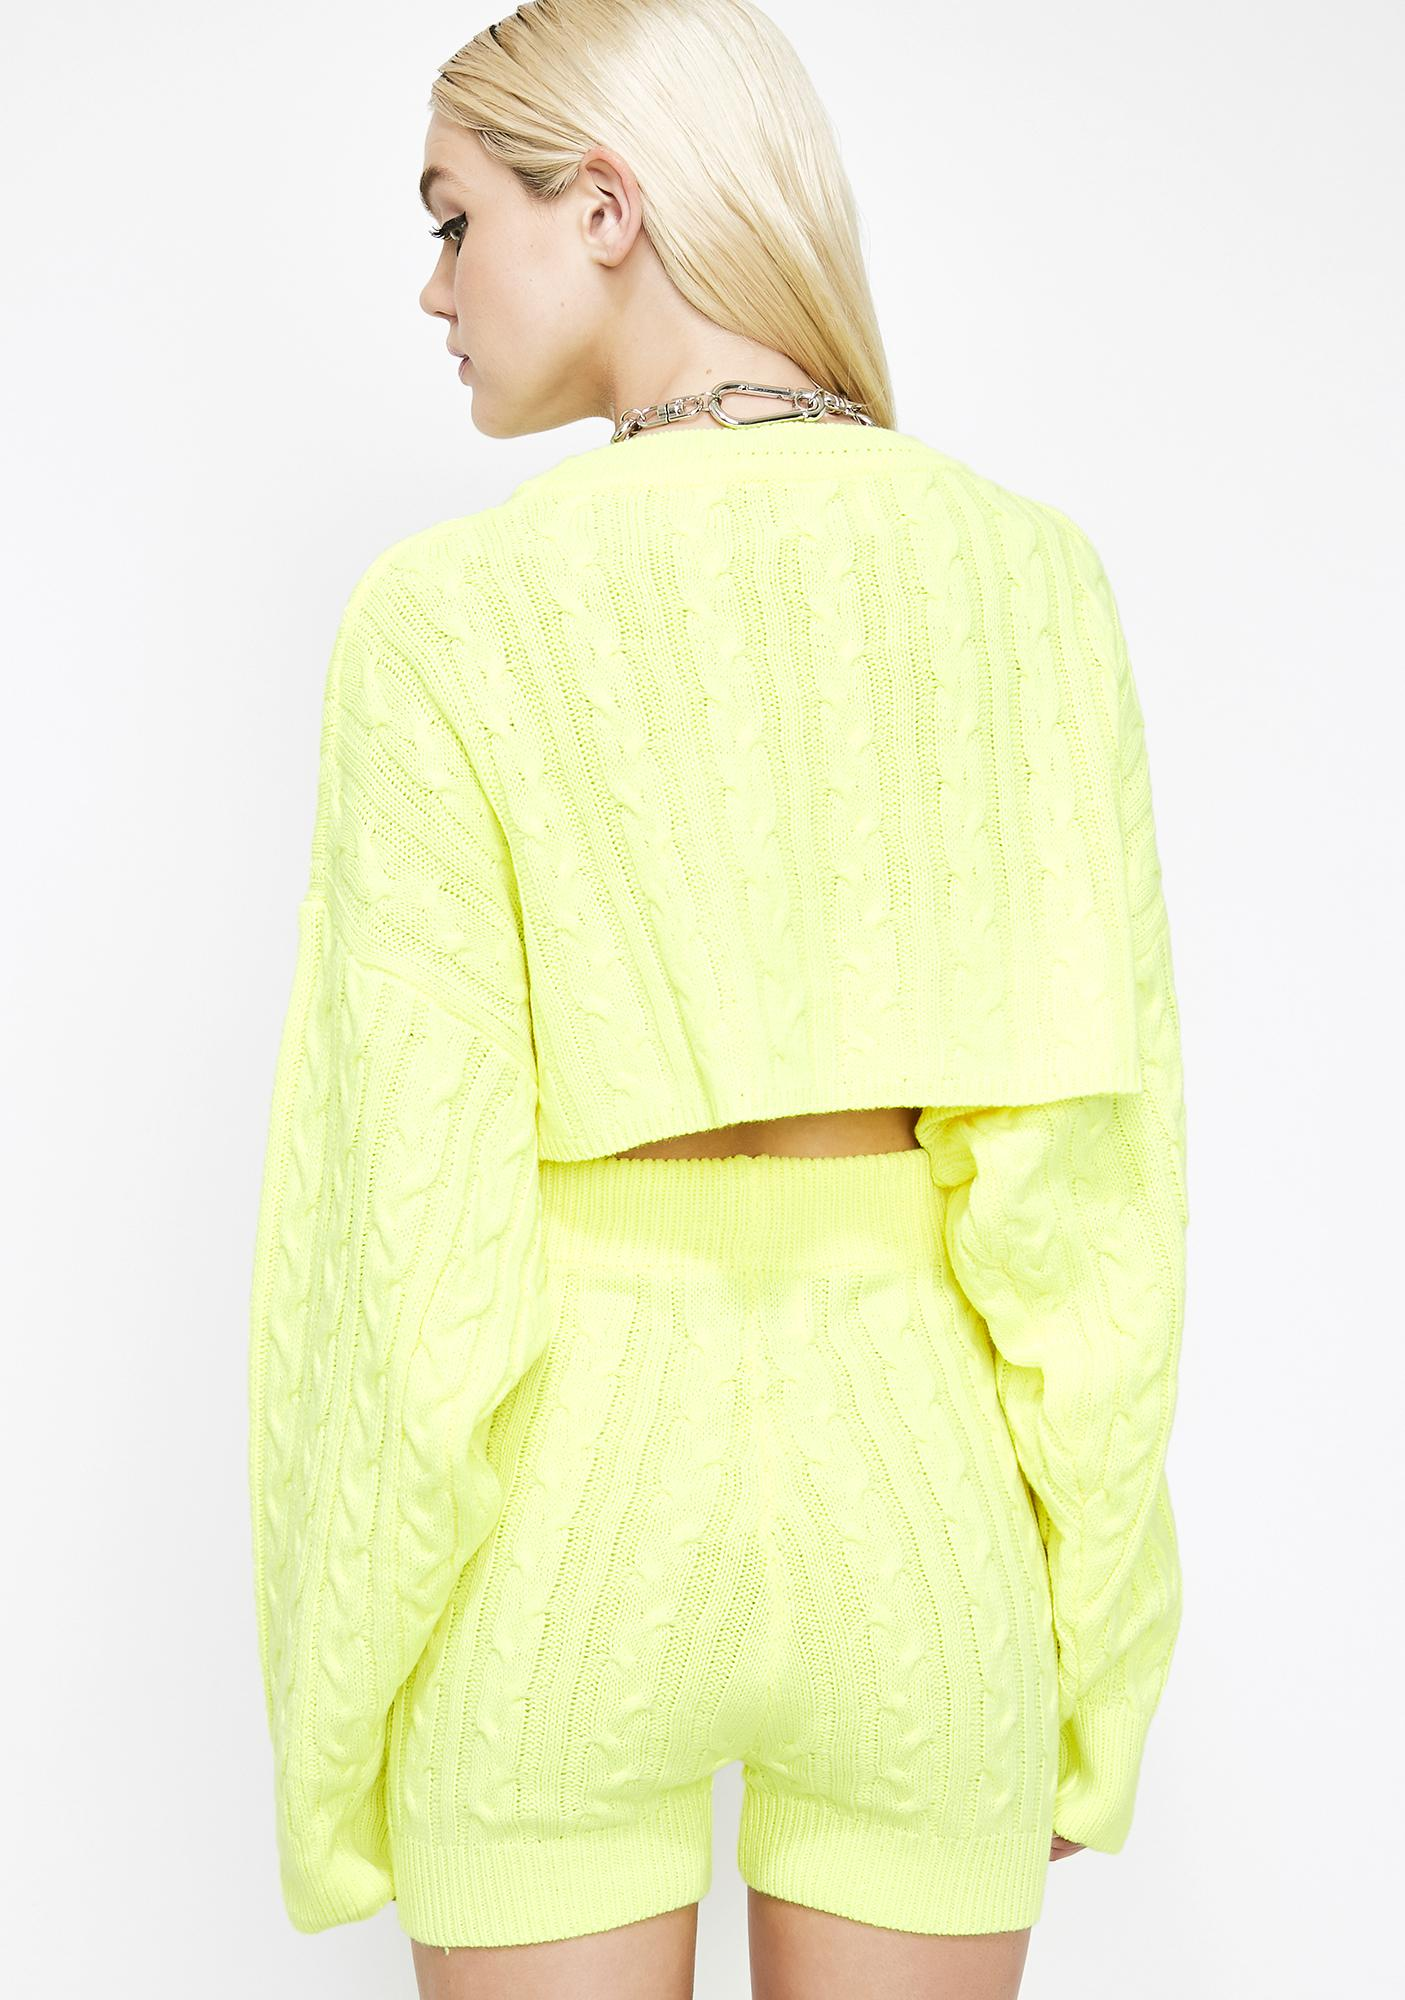 Takeover Knit Set